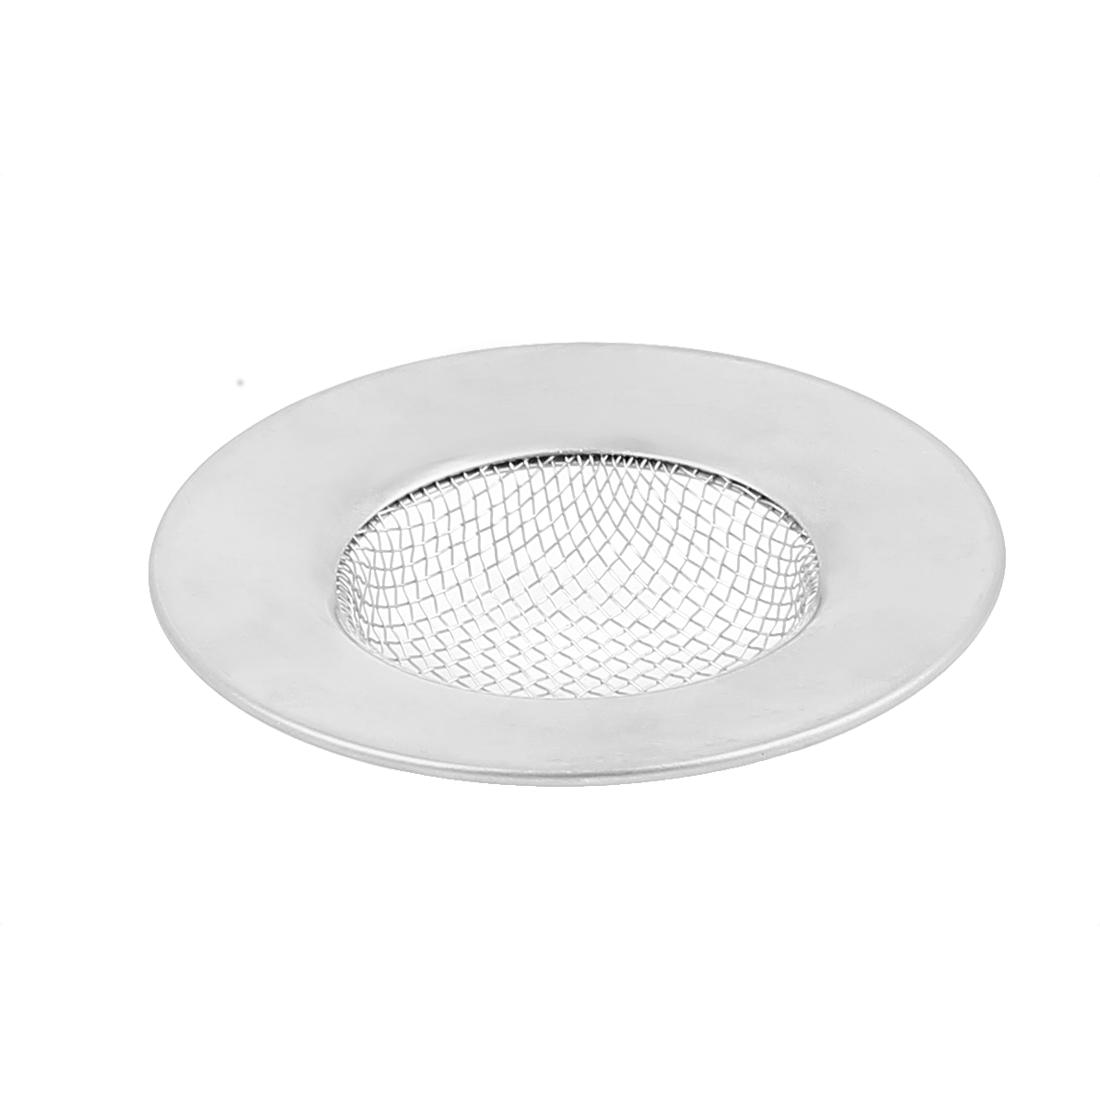 "Kitchen Bath Basin Sink Strainer Drain Stopper Silver Tone 2.5"" Dia"